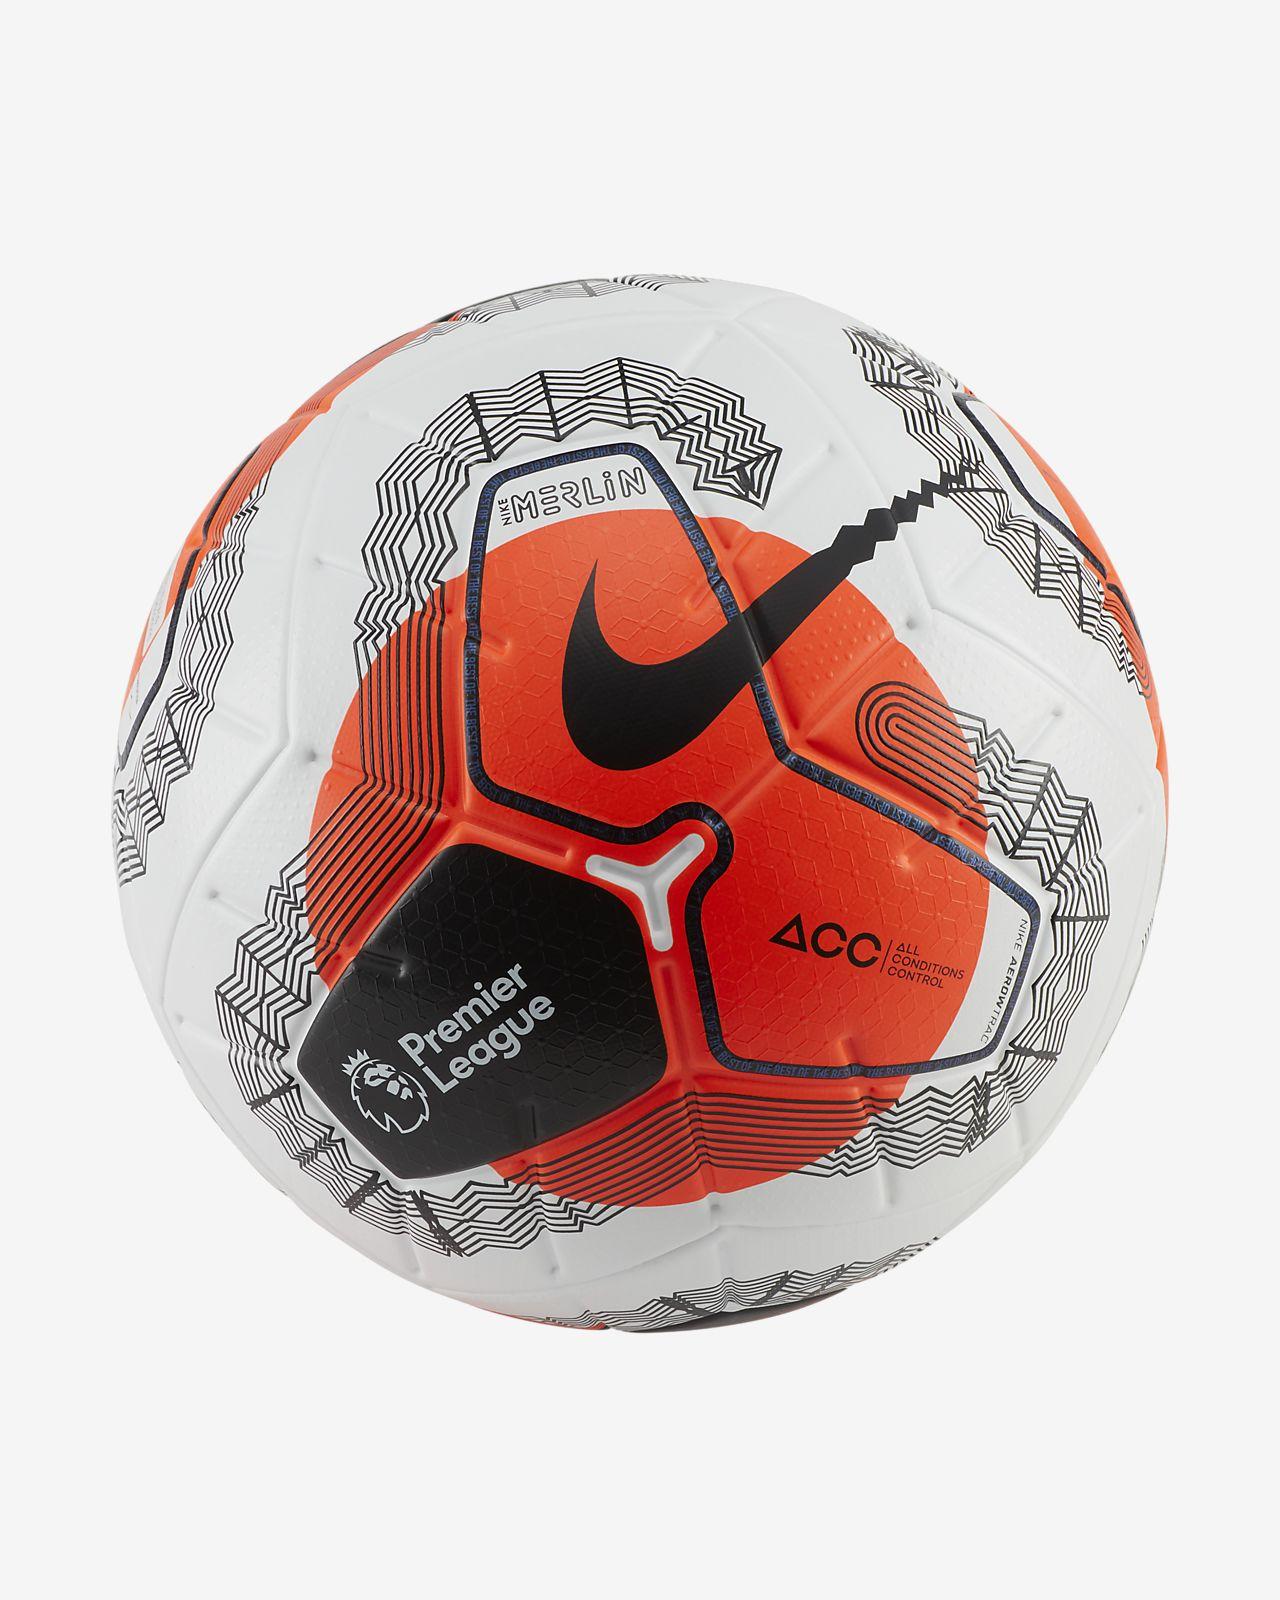 Premier League Tunnel Vision Merlin Soccer Ball